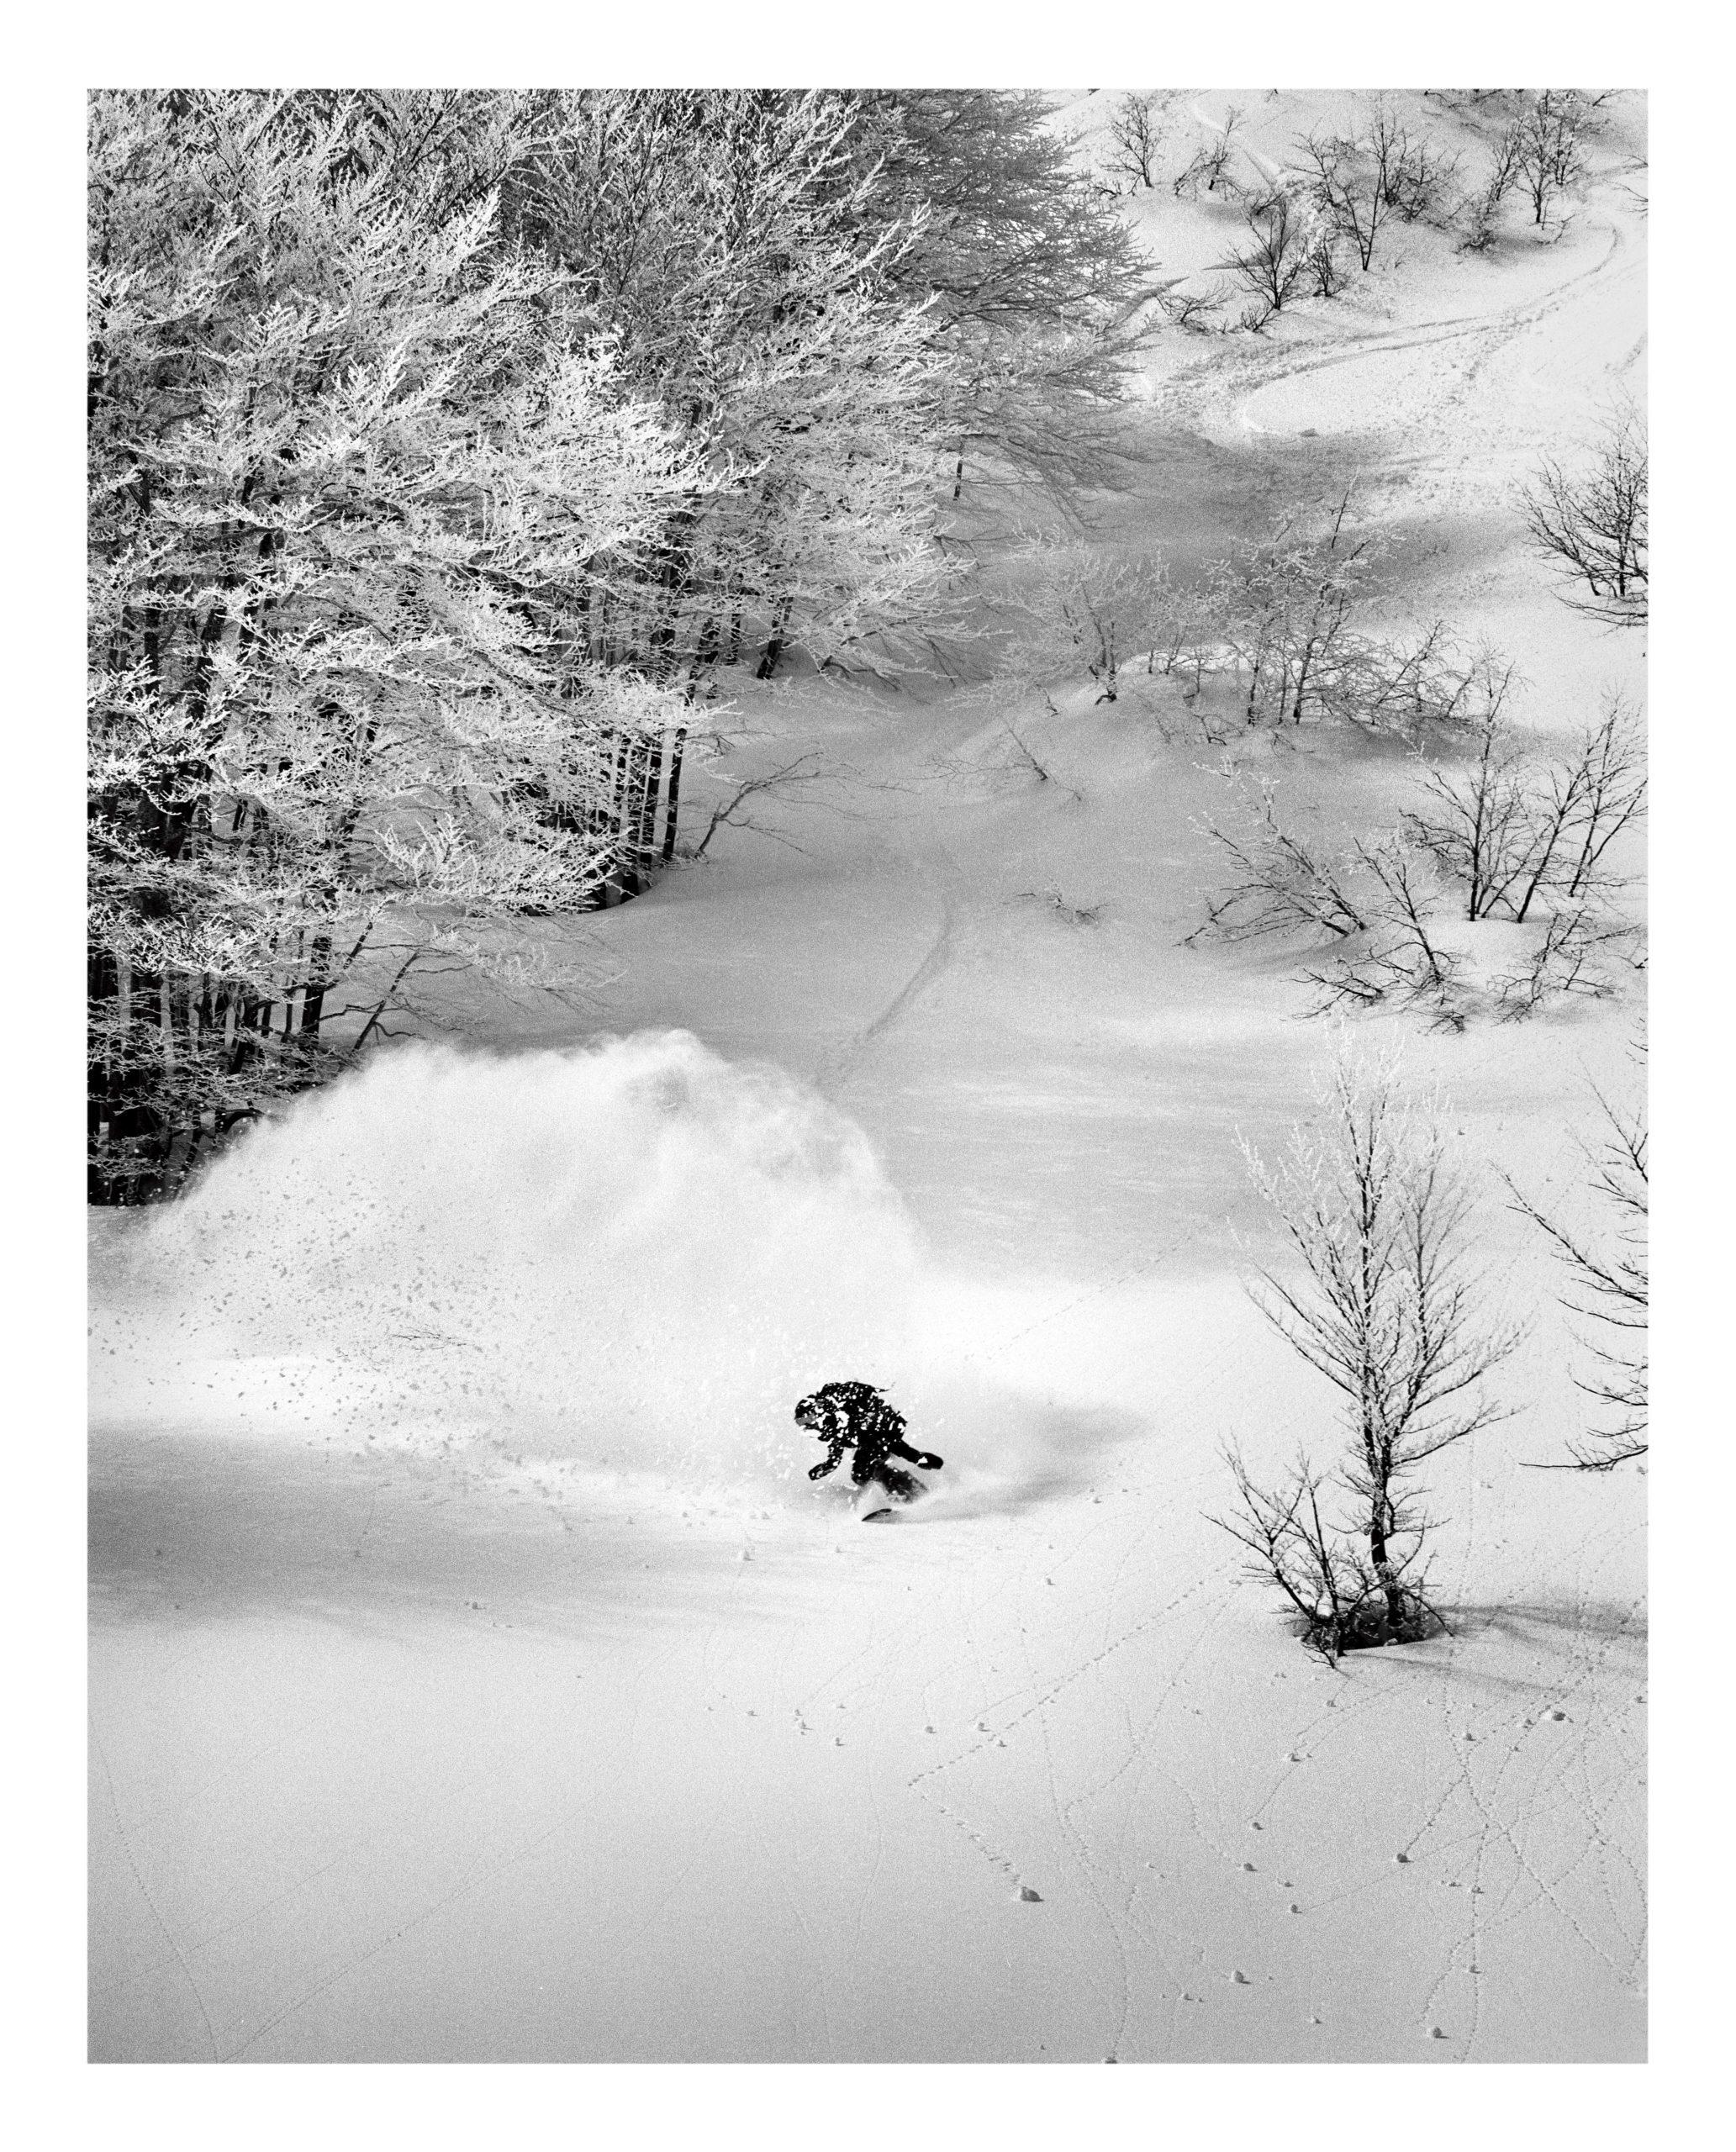 Victor Daviet Jerome Tanon Nils Mindnich snowboard